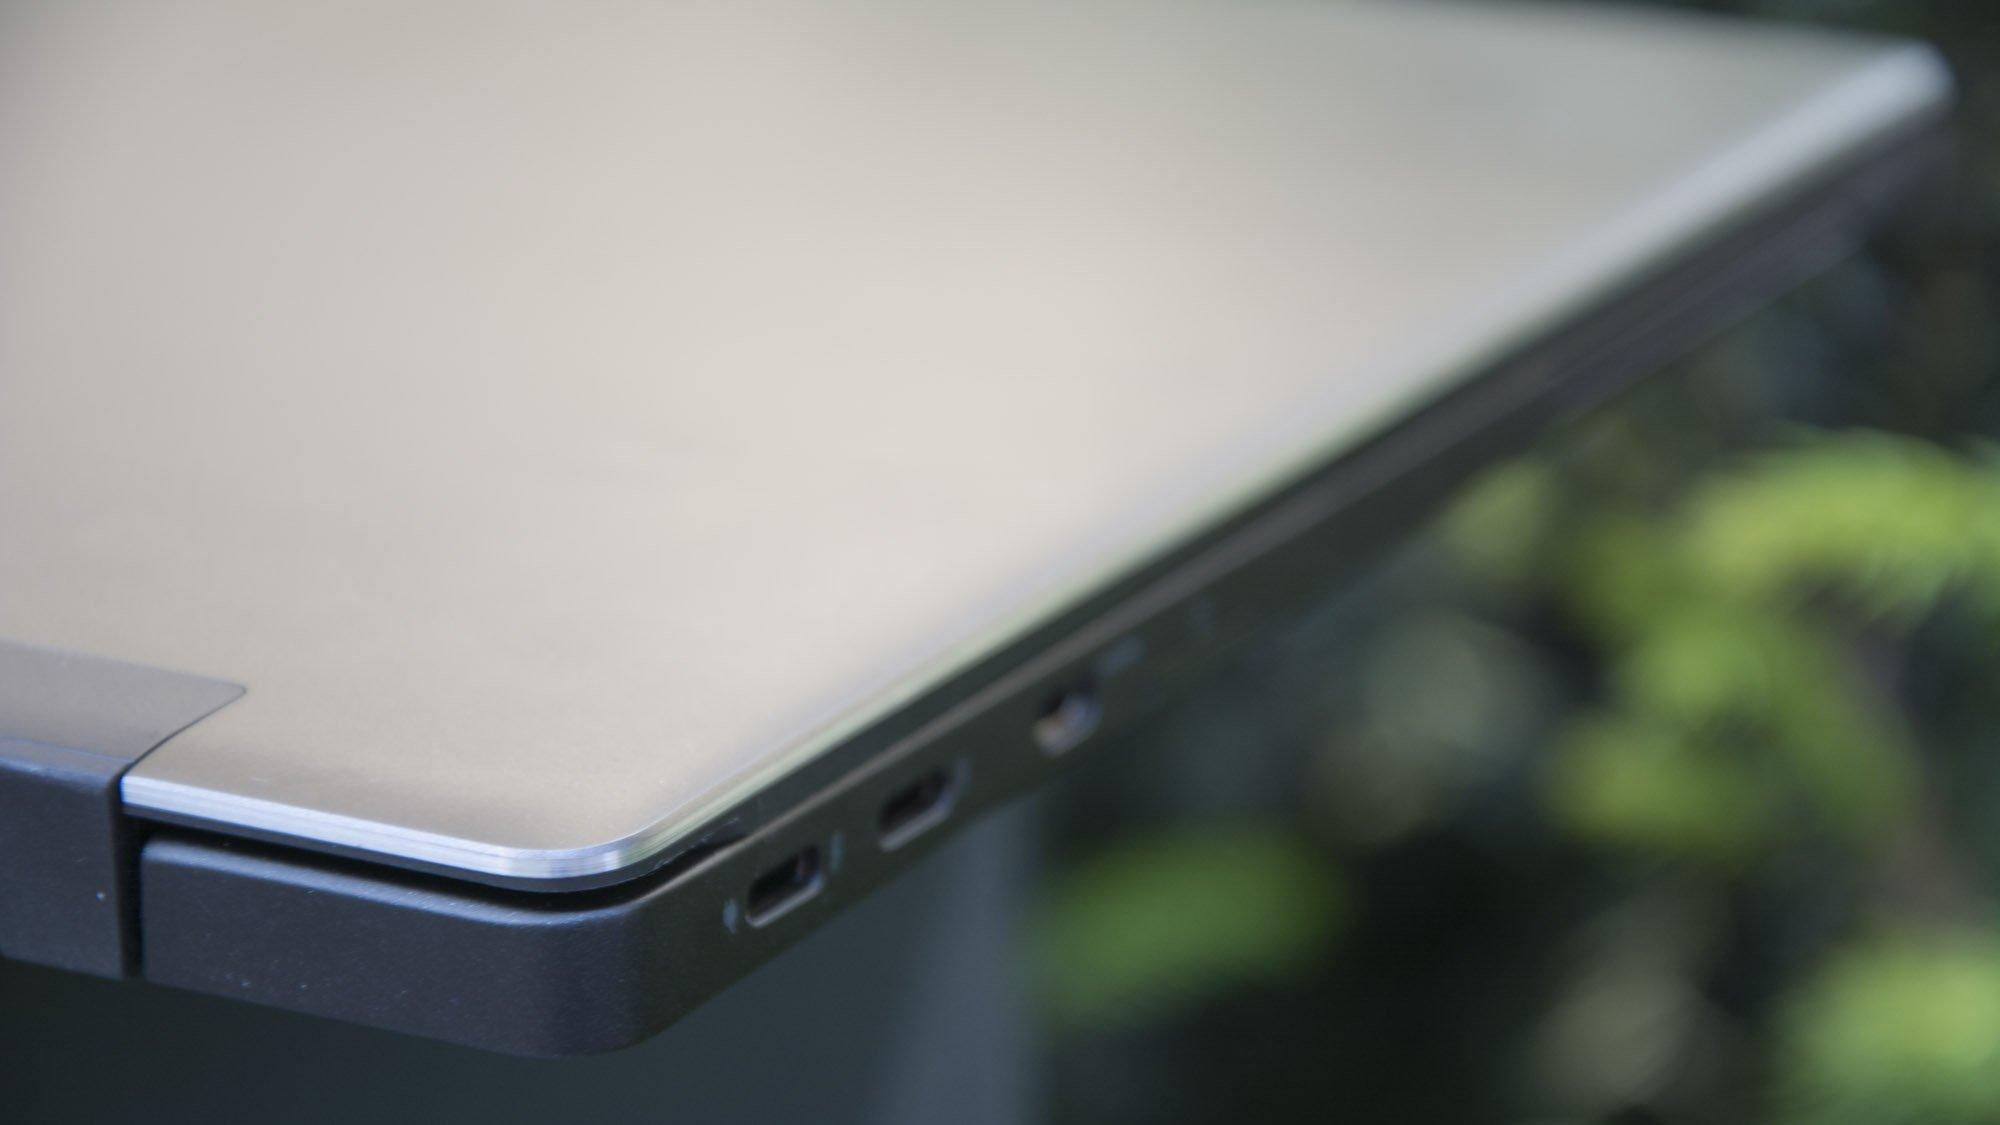 Dell Latitude 13 7370 review - a premium business laptop